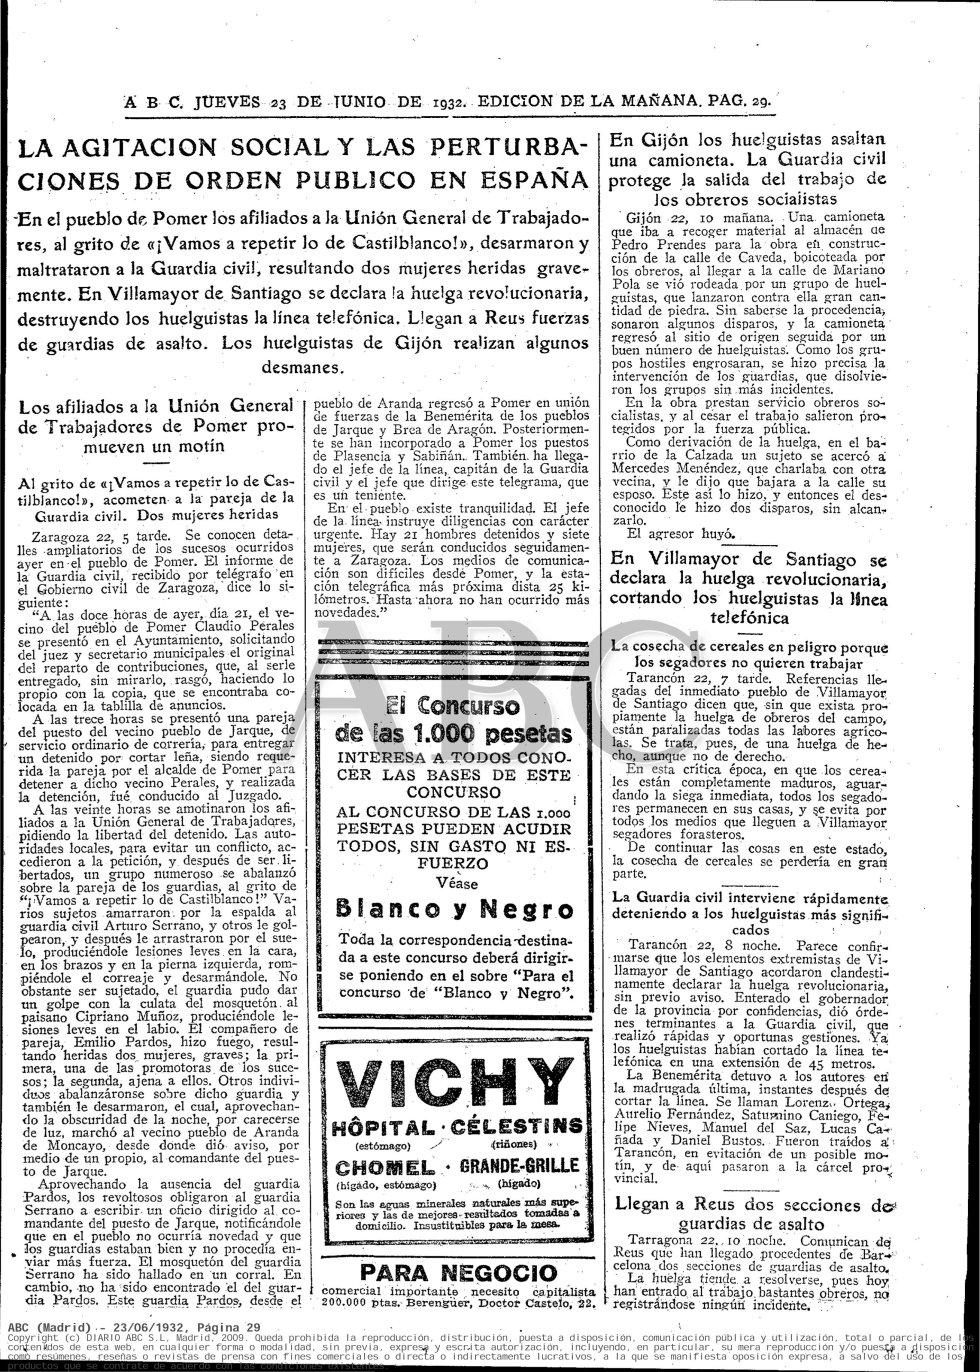 Periódico ABC. Fecha: 23 de junio de 1932. Edición de la mañana. Pág. 29. Enlace: http://hemeroteca.abc.es/nav/Navigate.exe/hemeroteca/madrid/abc/1932/06/23/029.html